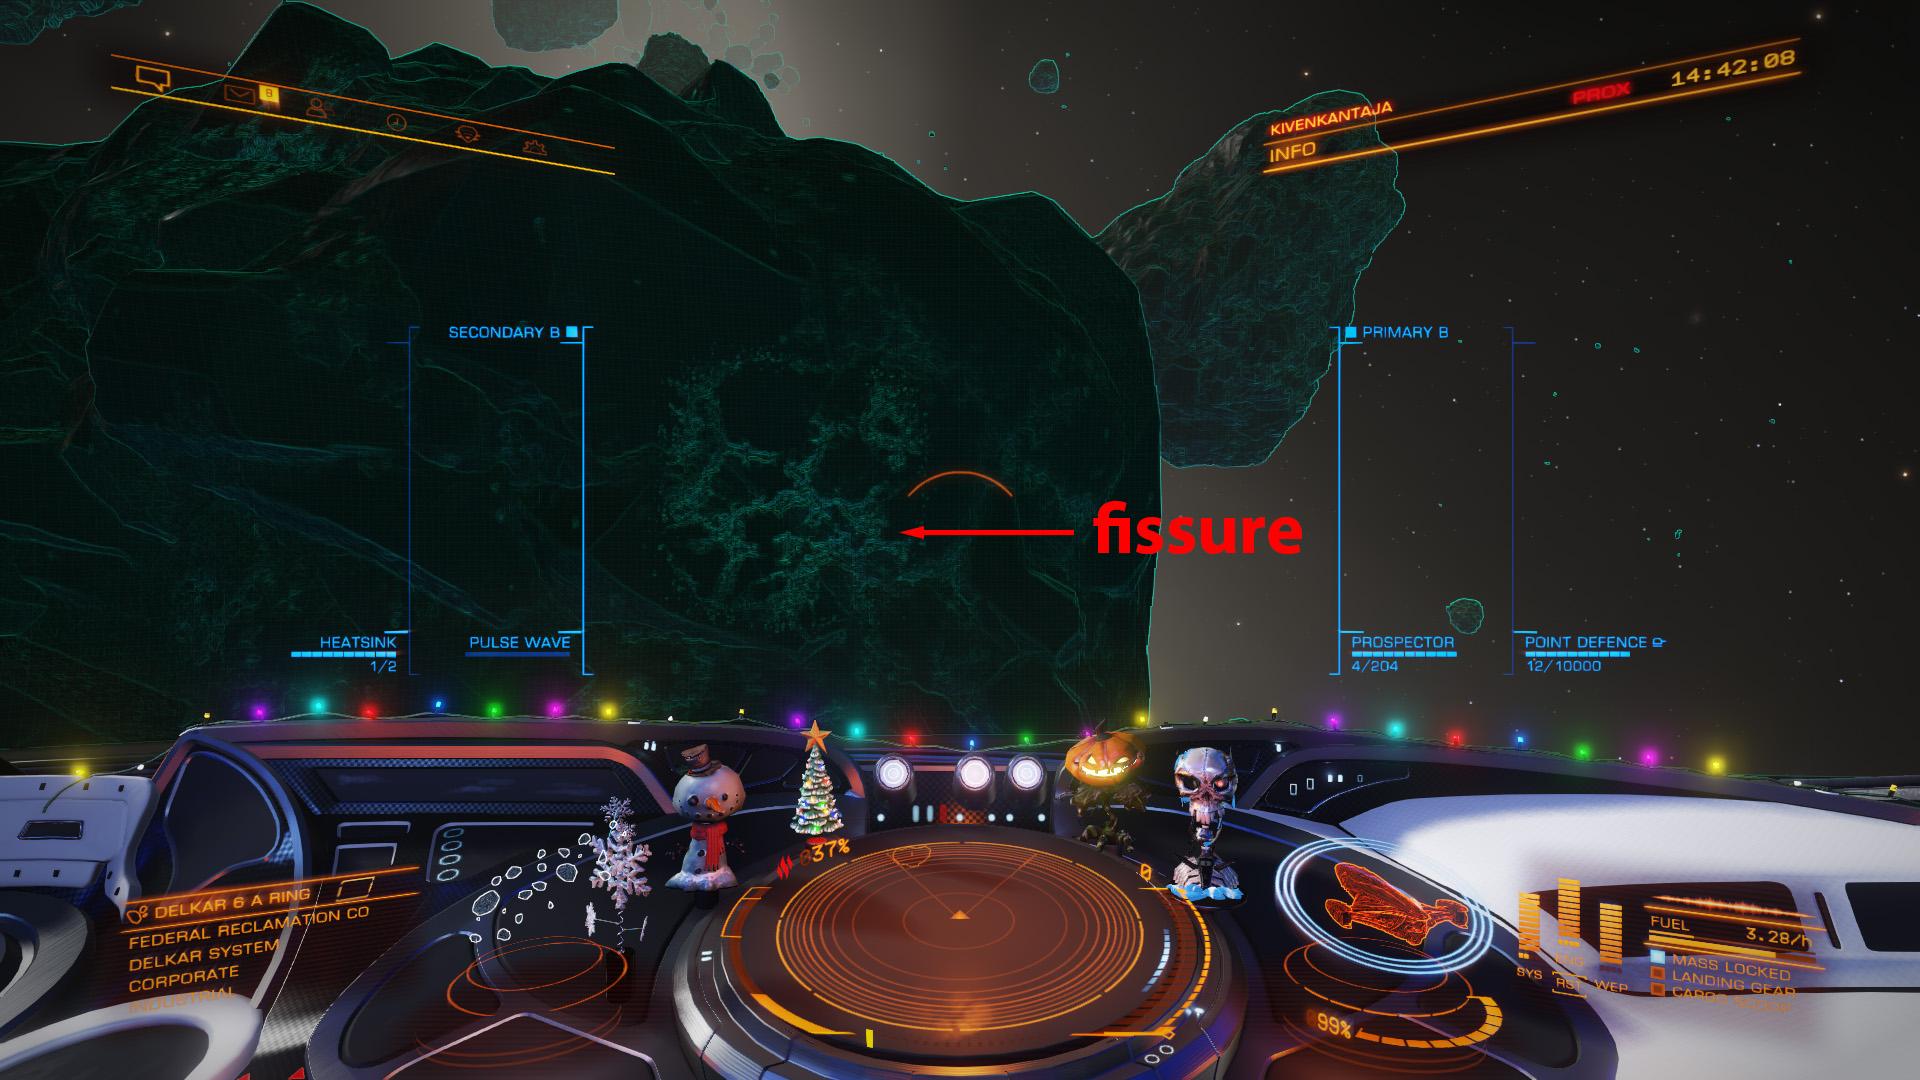 Elite: Dangerous beginner's guide: a screenshot showing a fissure on a metallic megalode asteroid